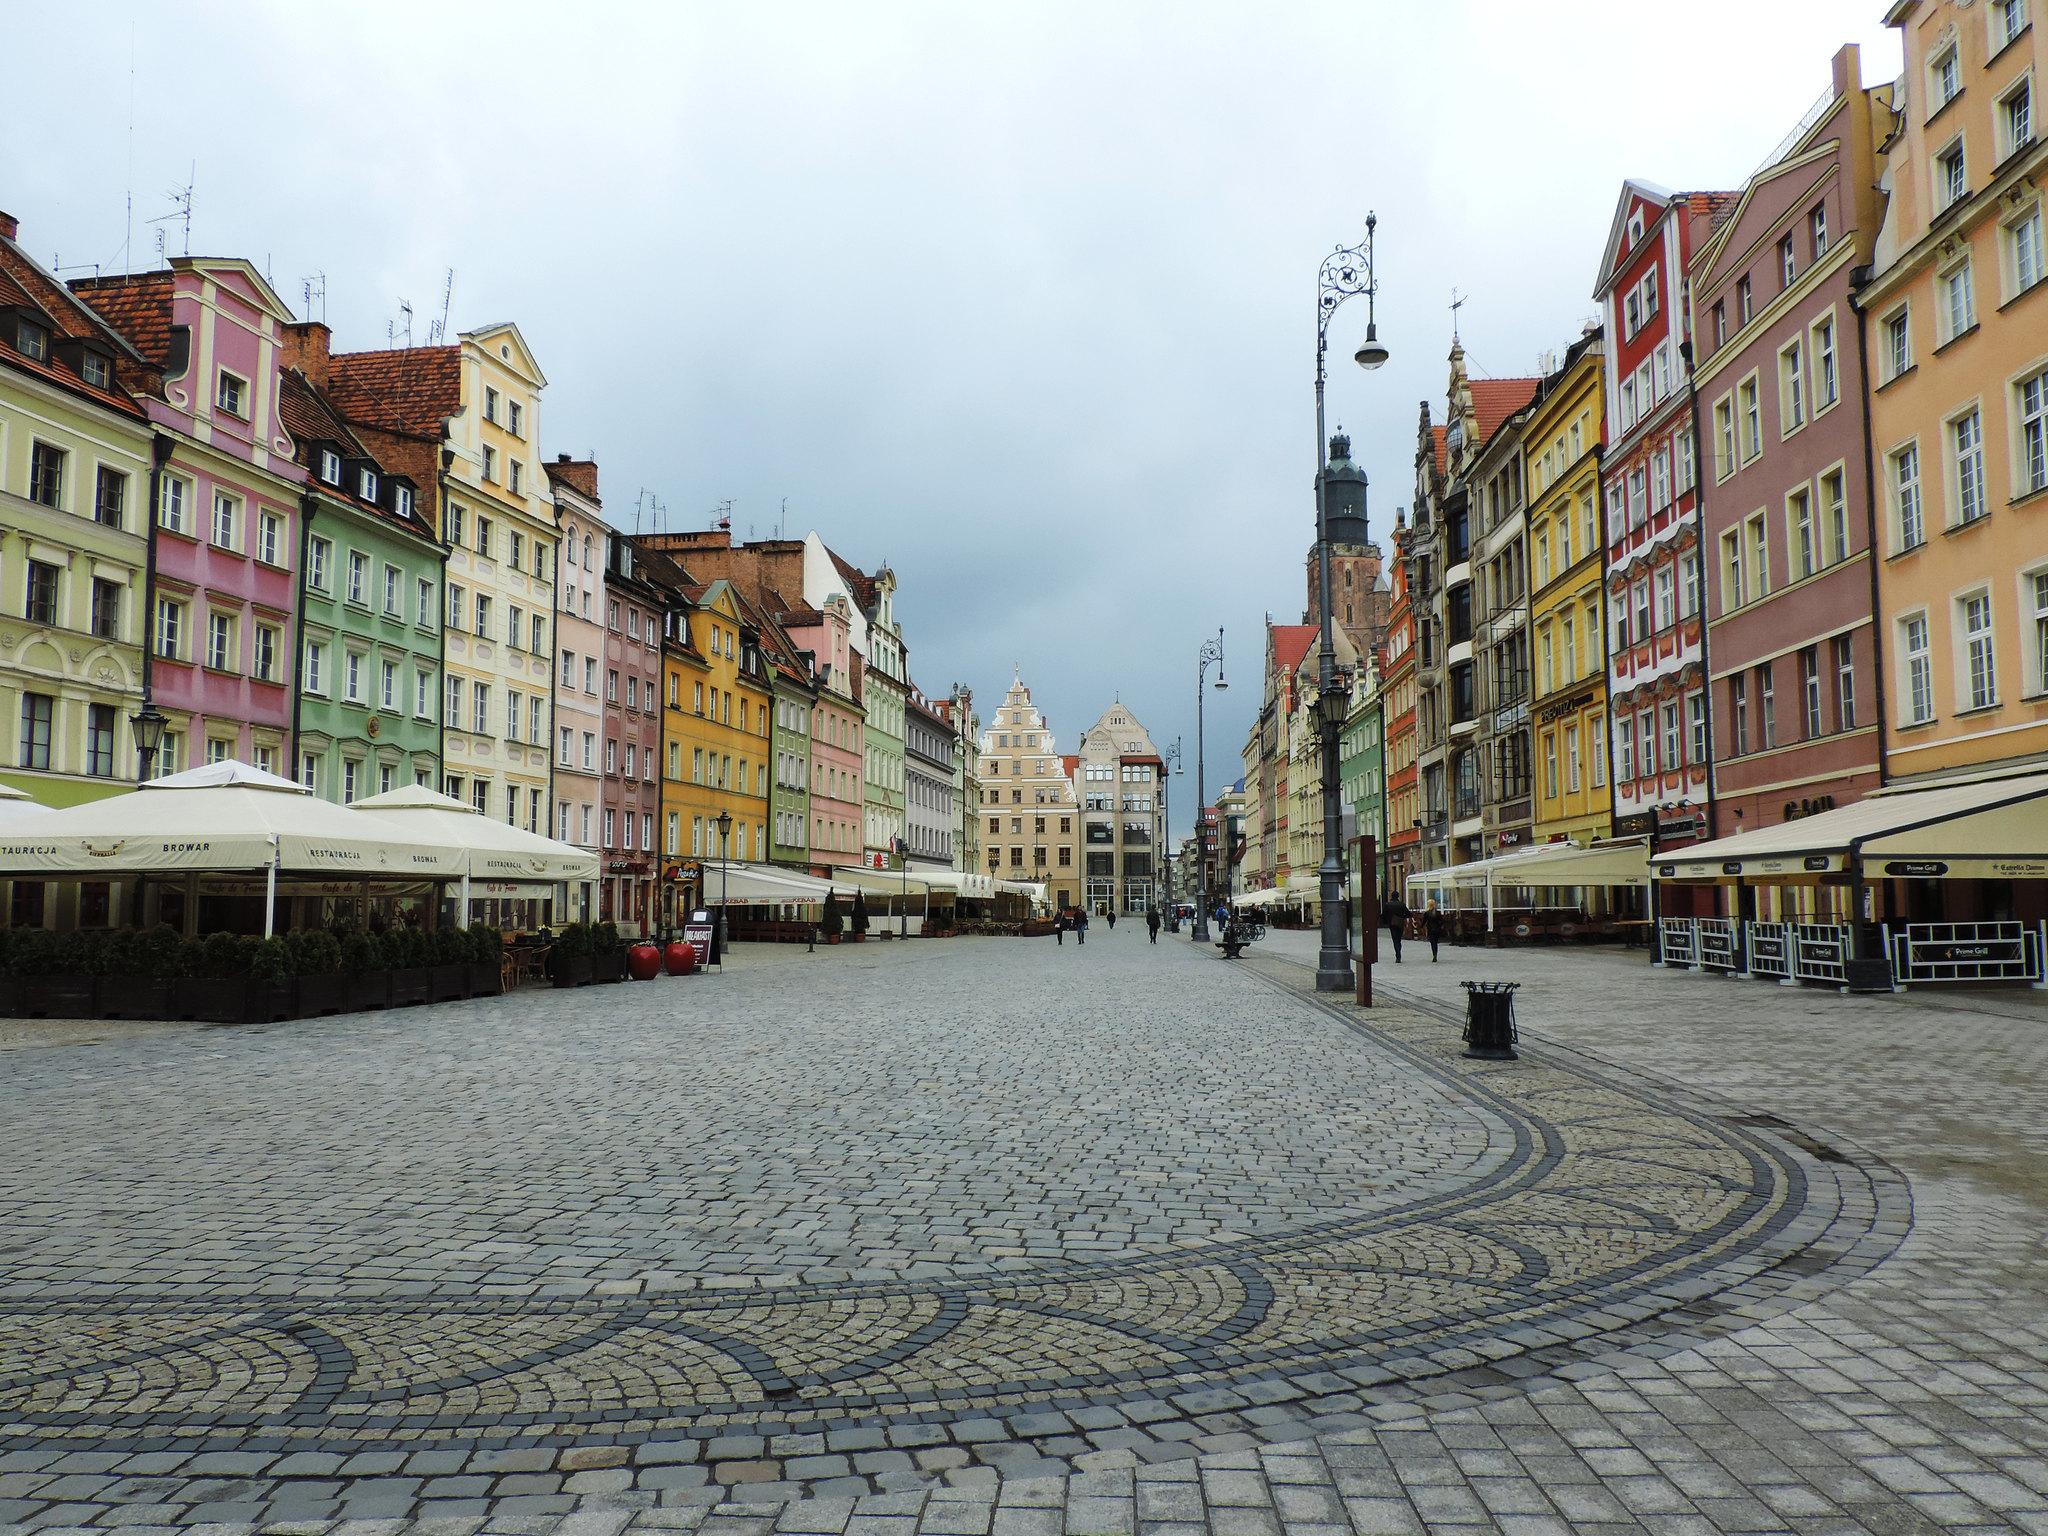 Main Market Square, Wrocław, Poland